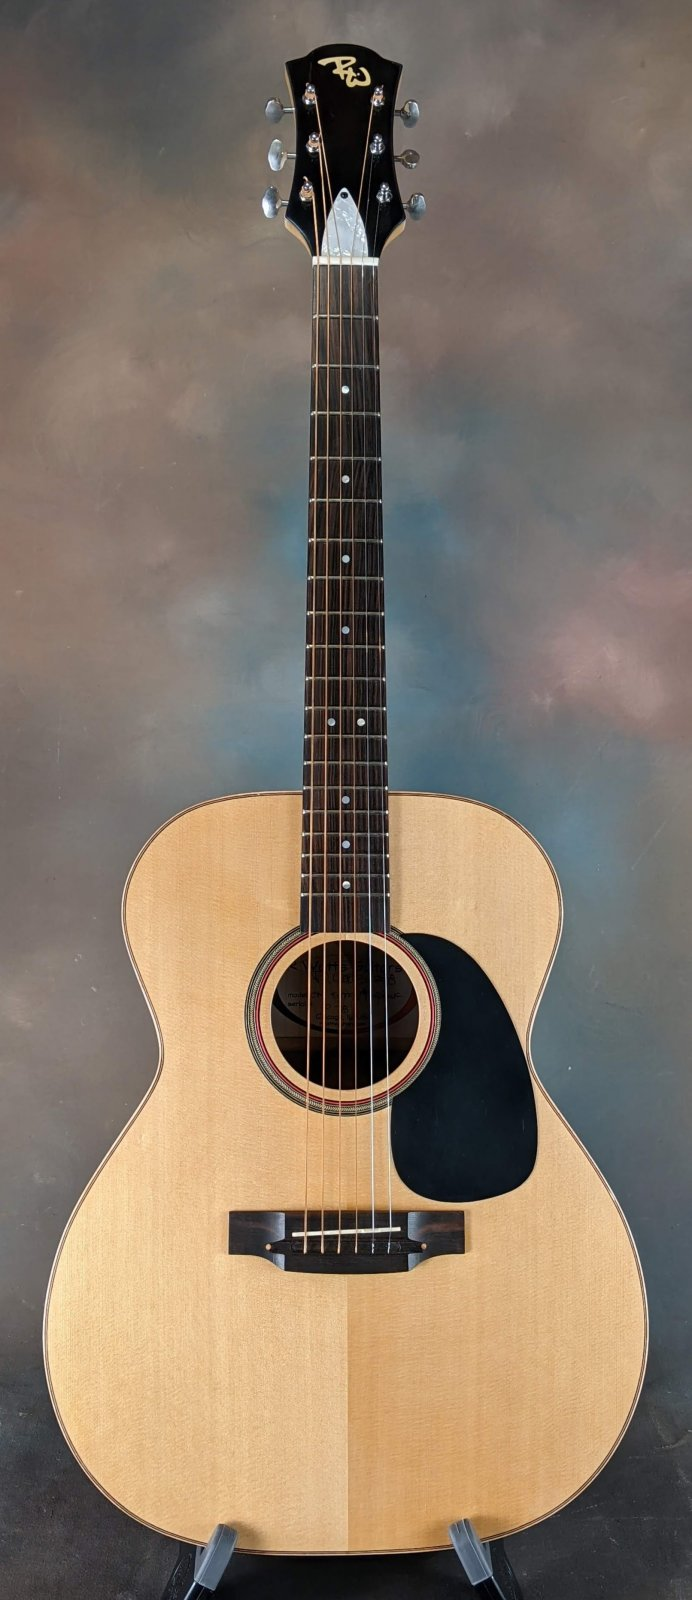 Richard Watts OM Steel String - Padauk